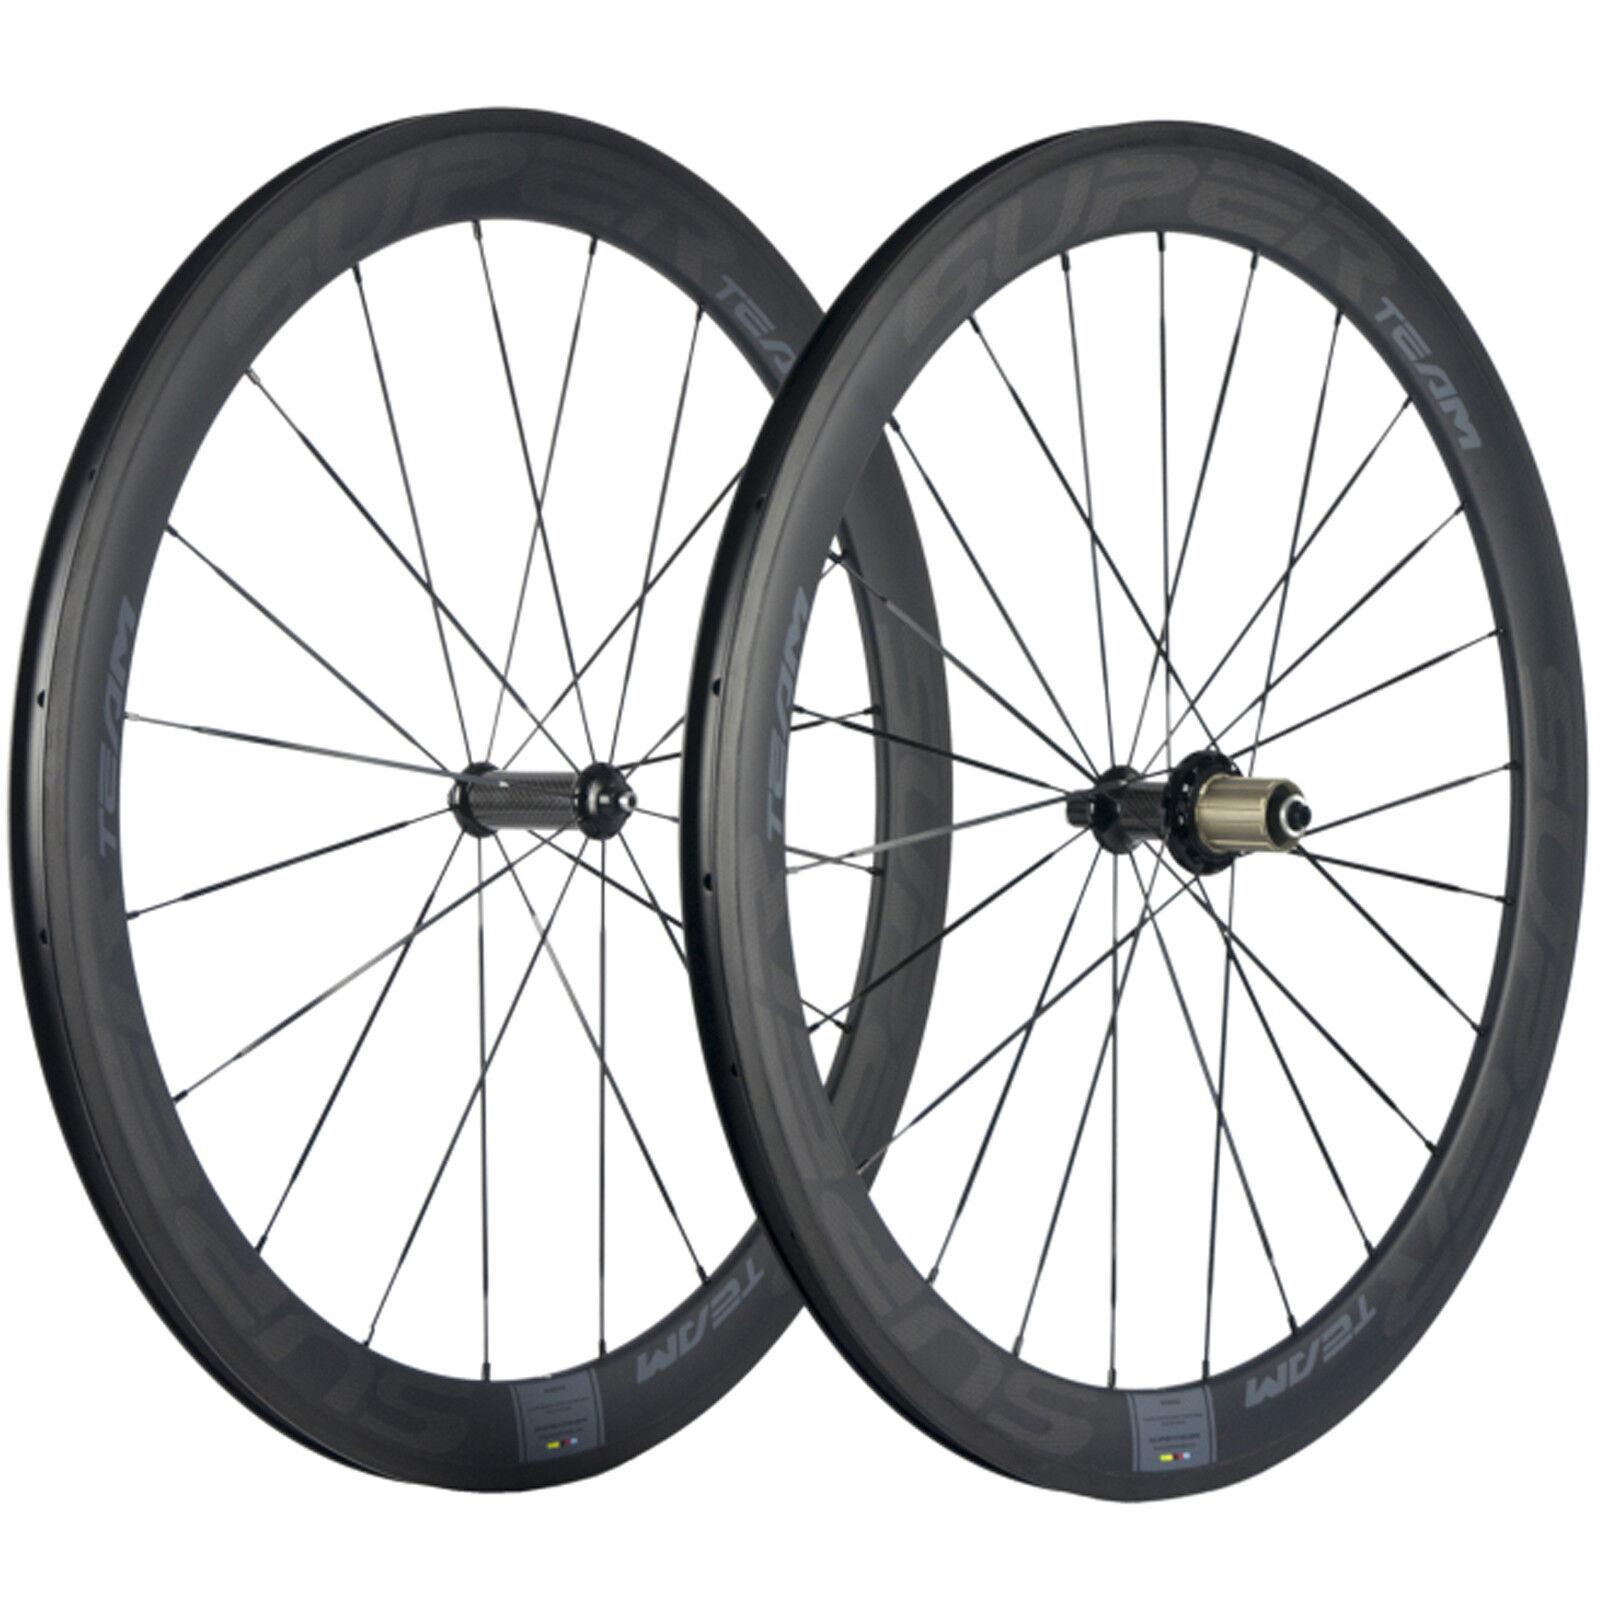 Superteam 50mm Depth U shape 25mm Width Carbon Wheelset Clincher  Road Bike R36  your satisfaction is our target